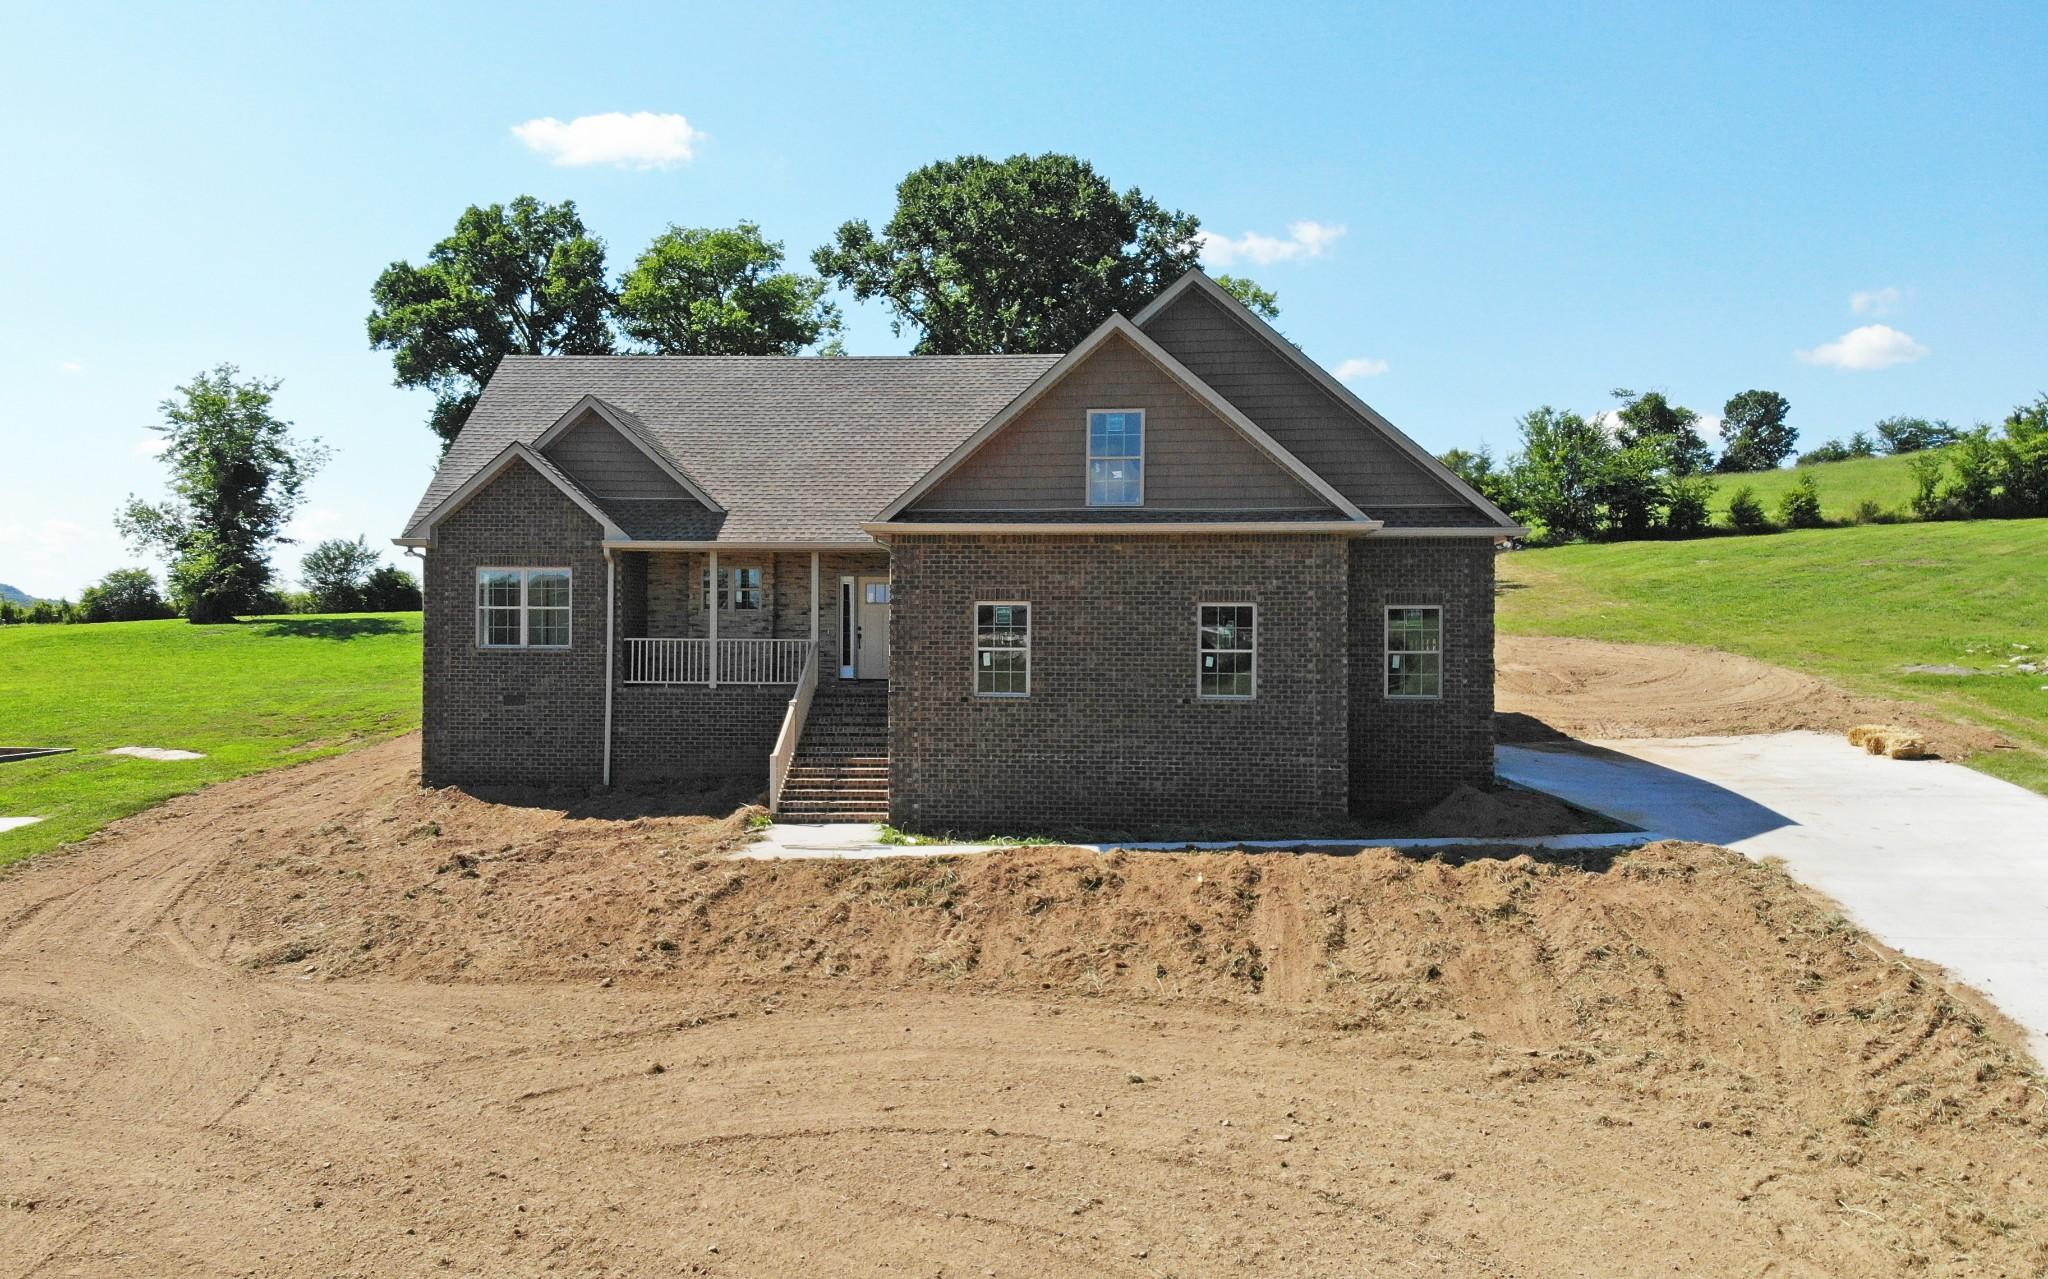 195 Bridle Path Ln, Hartsville, TN 37074 - Hartsville, TN real estate listing